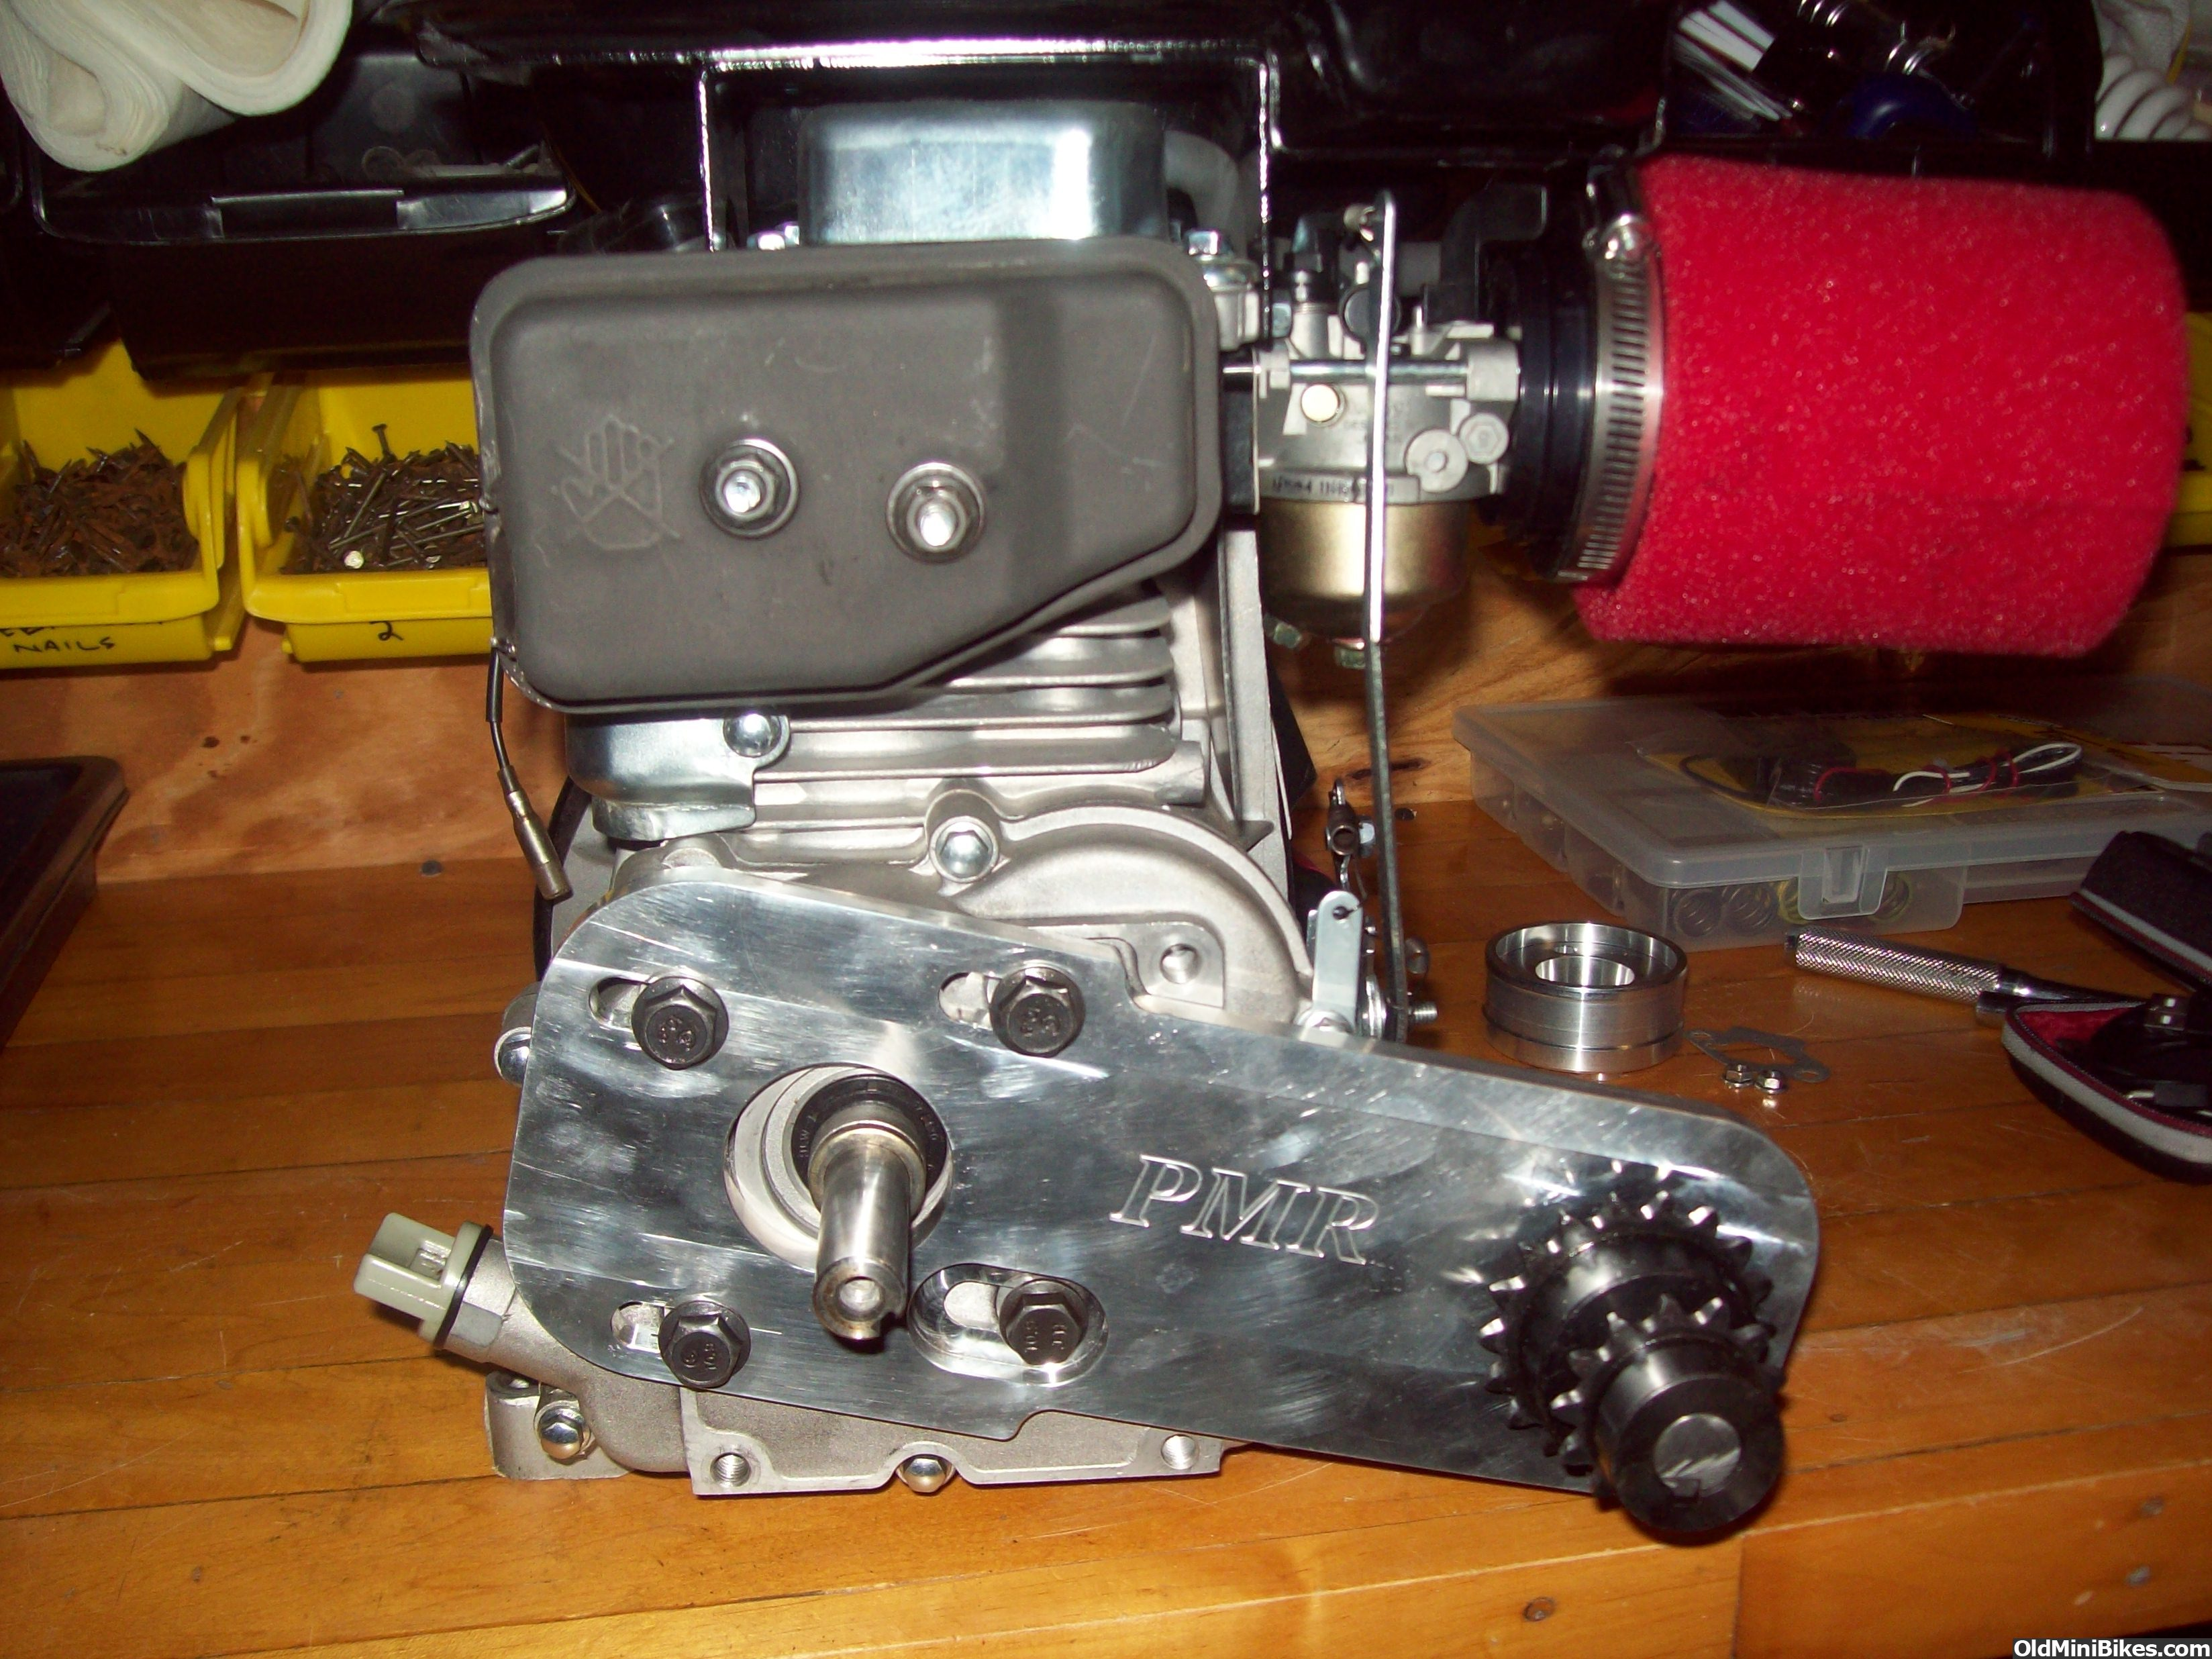 Predator 212cc Engine Images | TheFemaleCelebrity